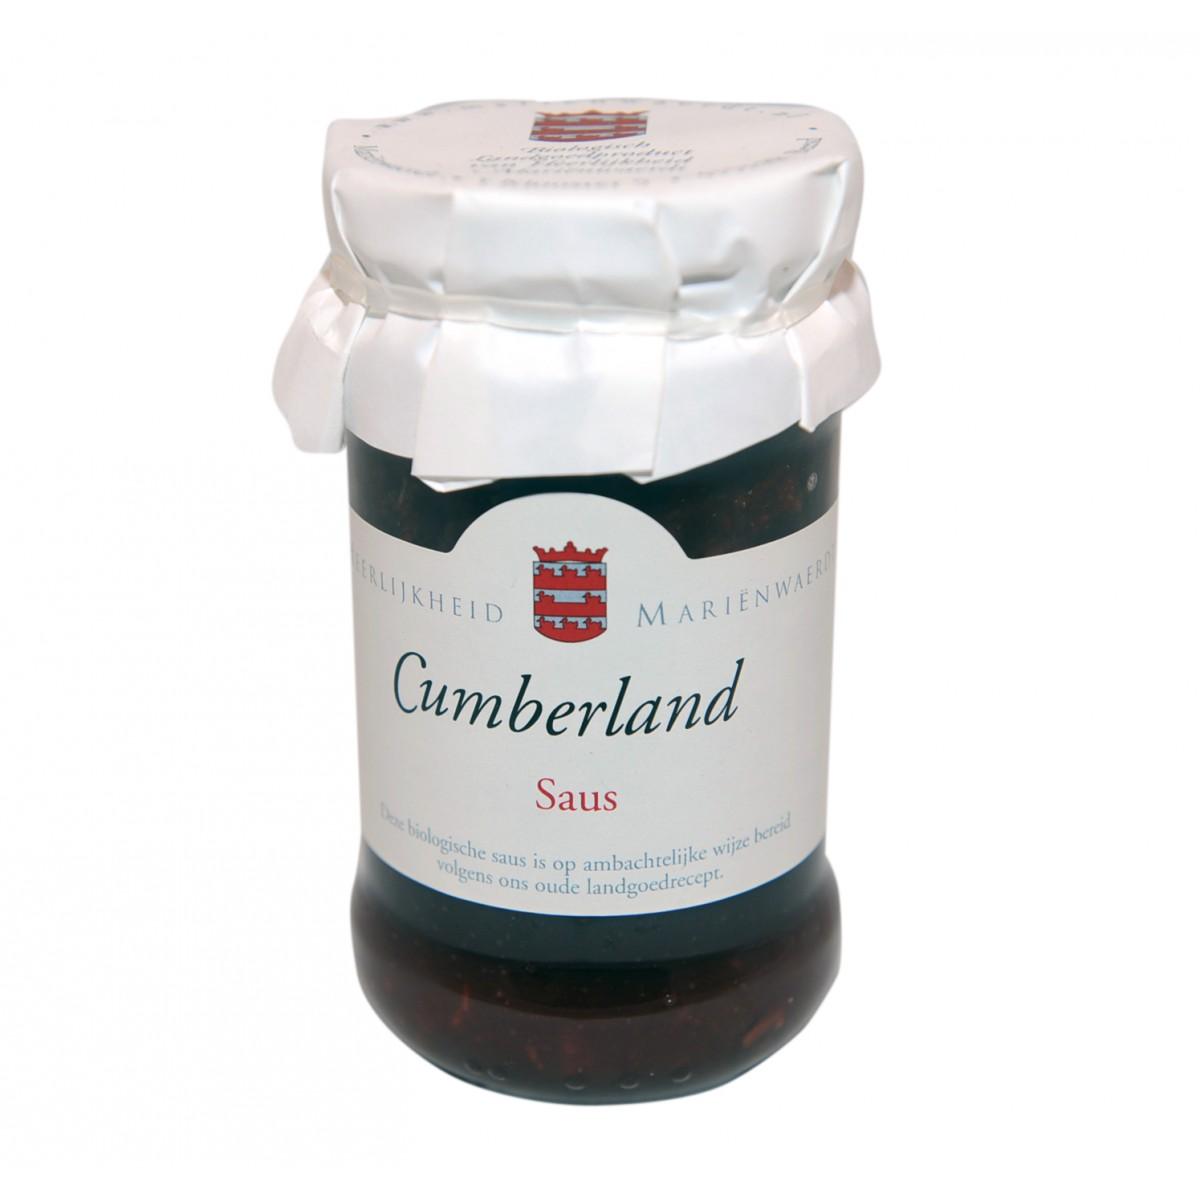 Cumberland Saus